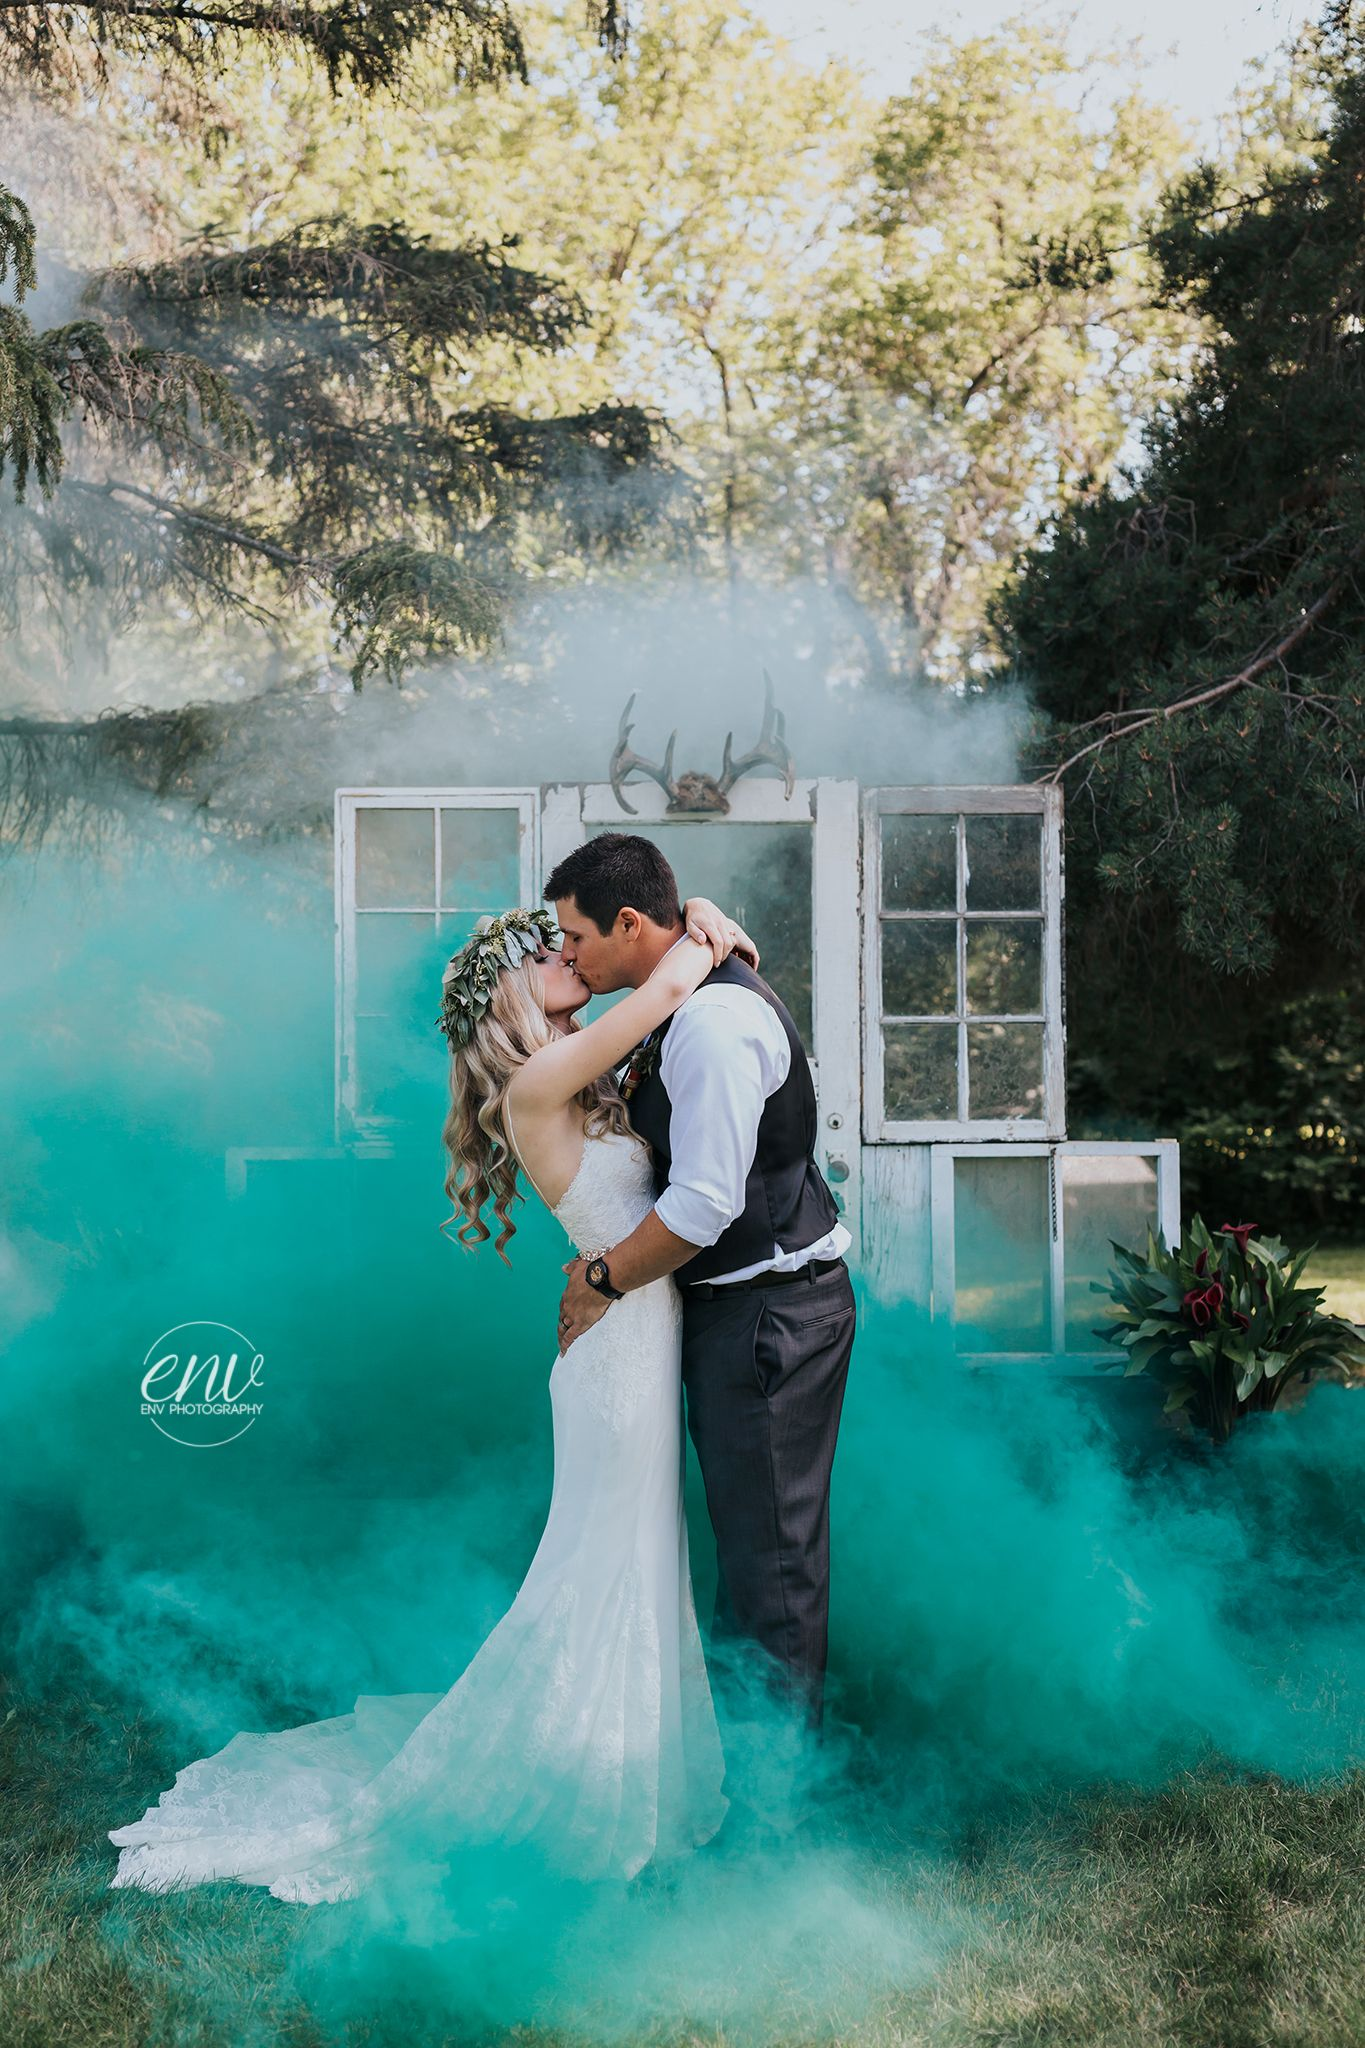 Edmonton Boho Wedding featuring smoke bombs & antlers   Fun